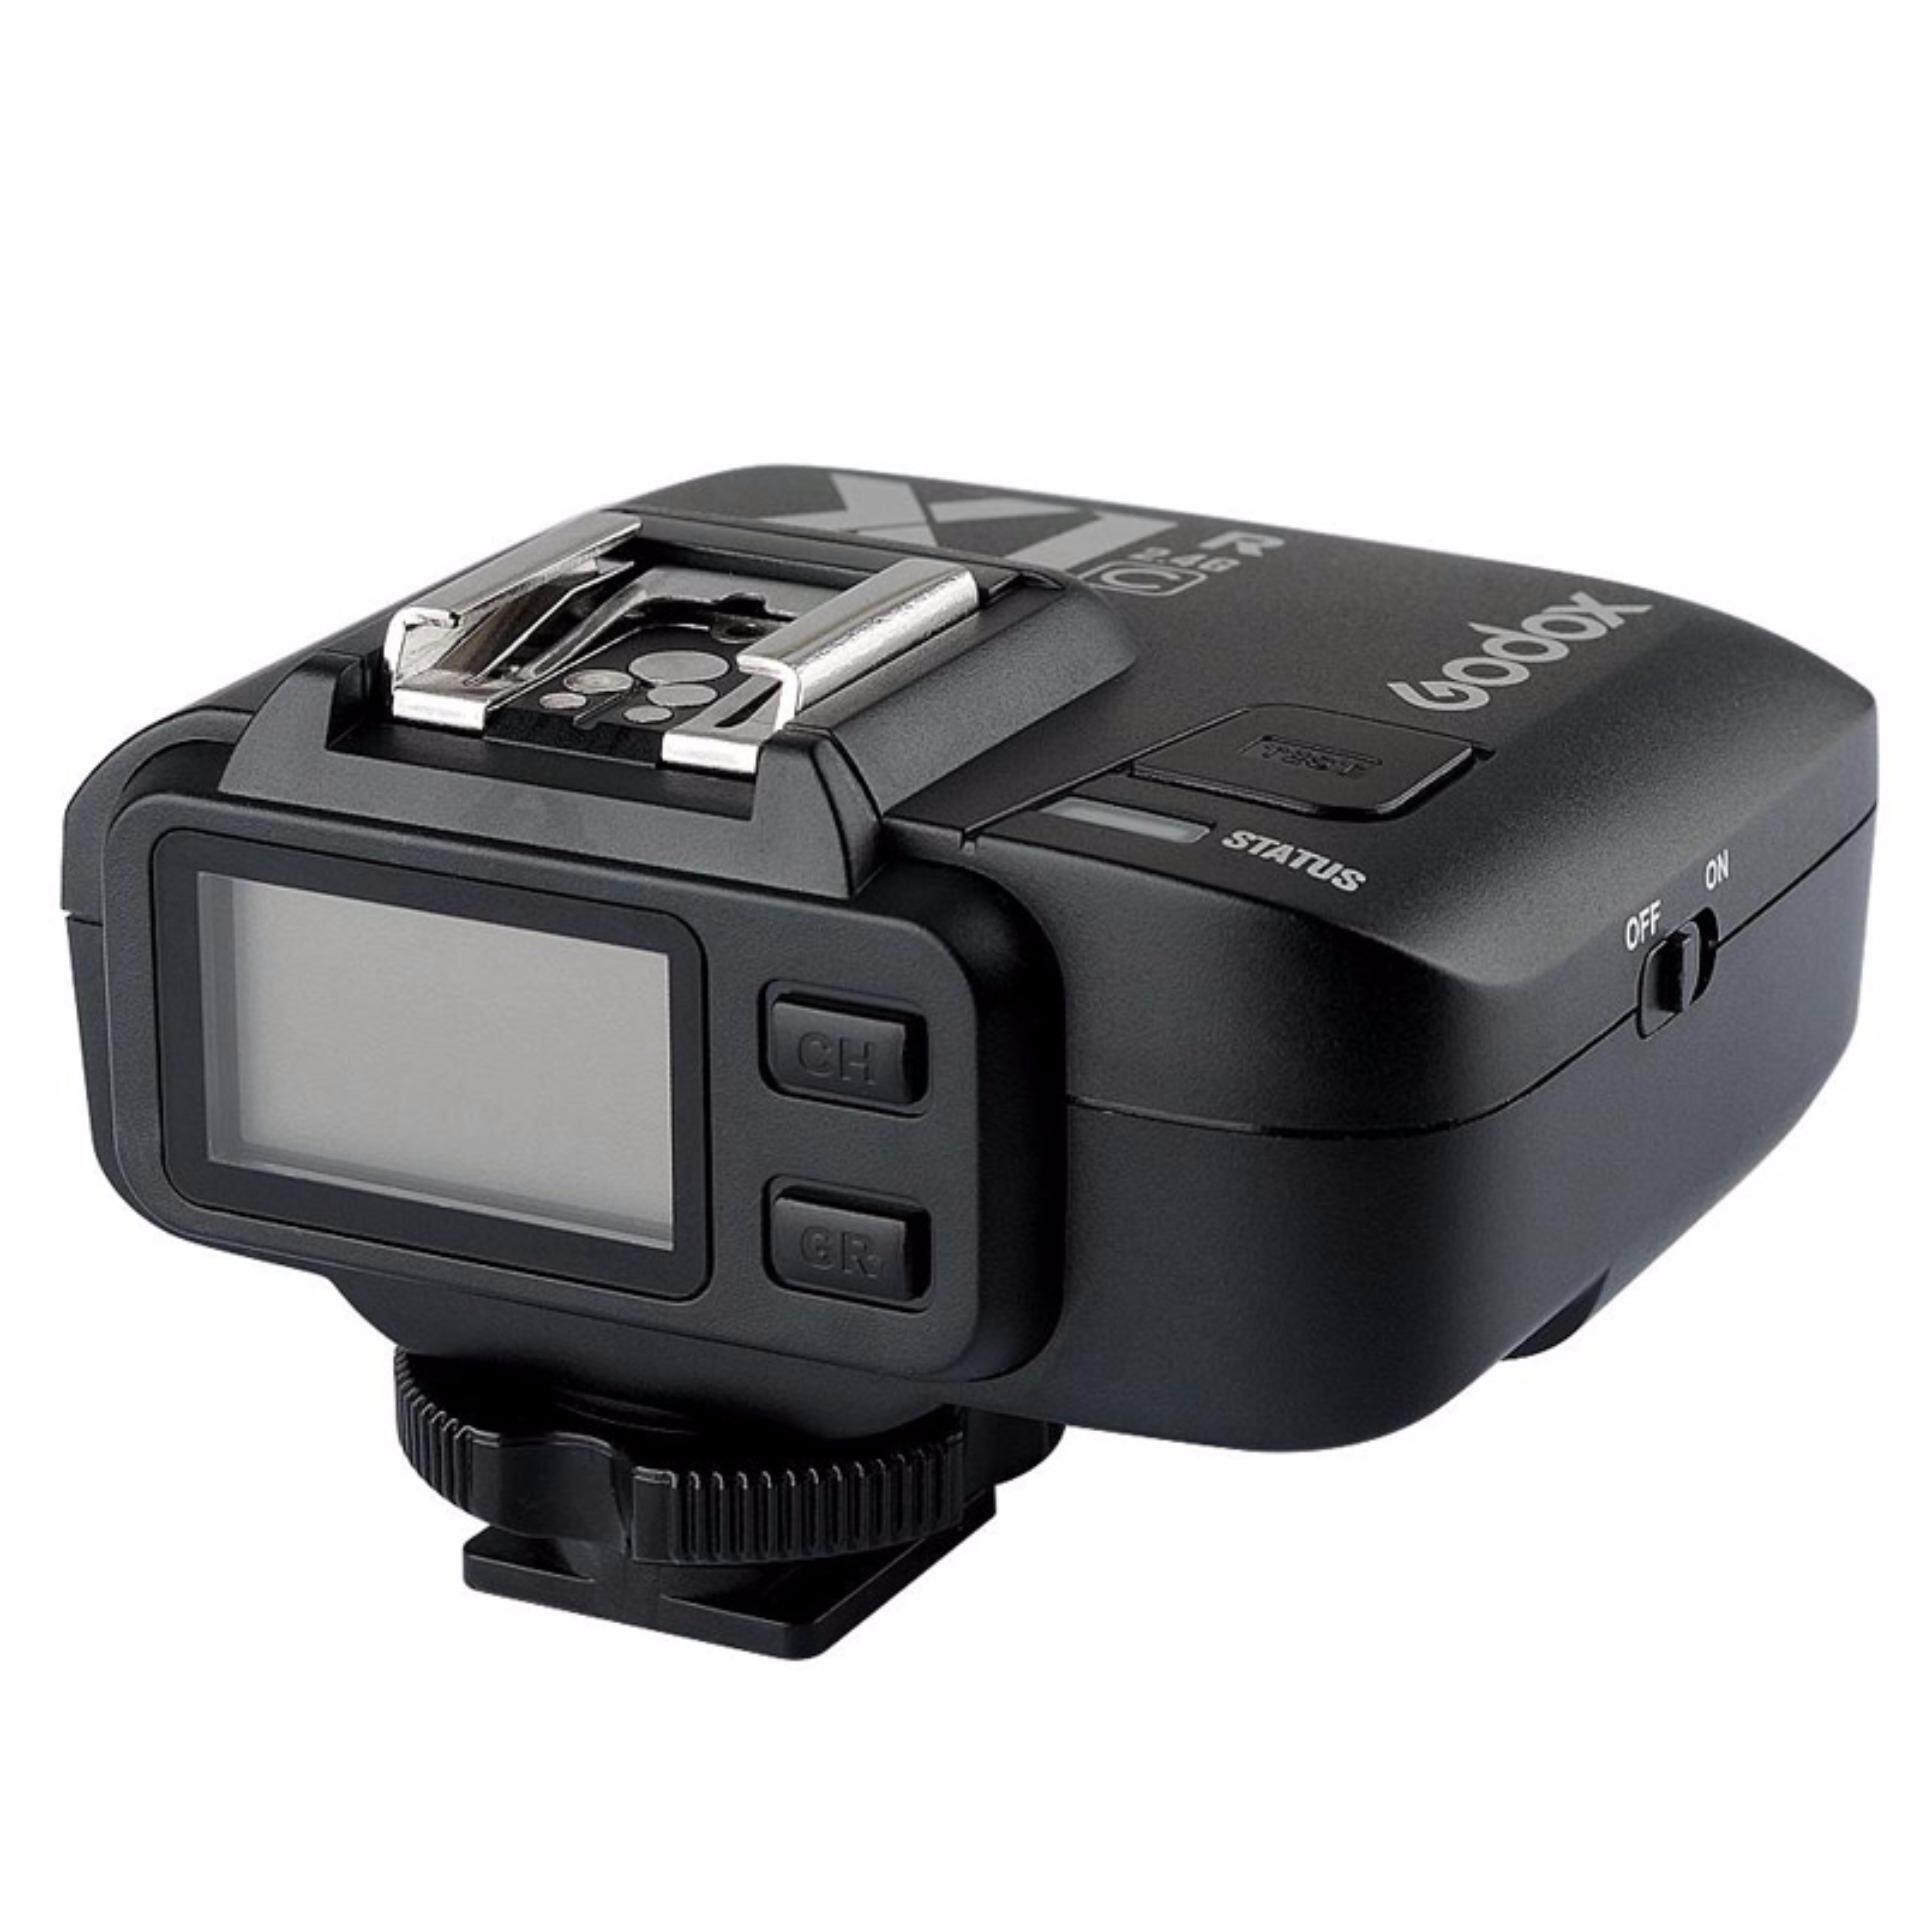 GODOX X1R-C 32 Saluran TTL 1/8000 S Wireless Remote Penerima Lampu Kilat Pelepasan Rana untuk Canon EOS GODOX X1T-C Transmitter- internasional